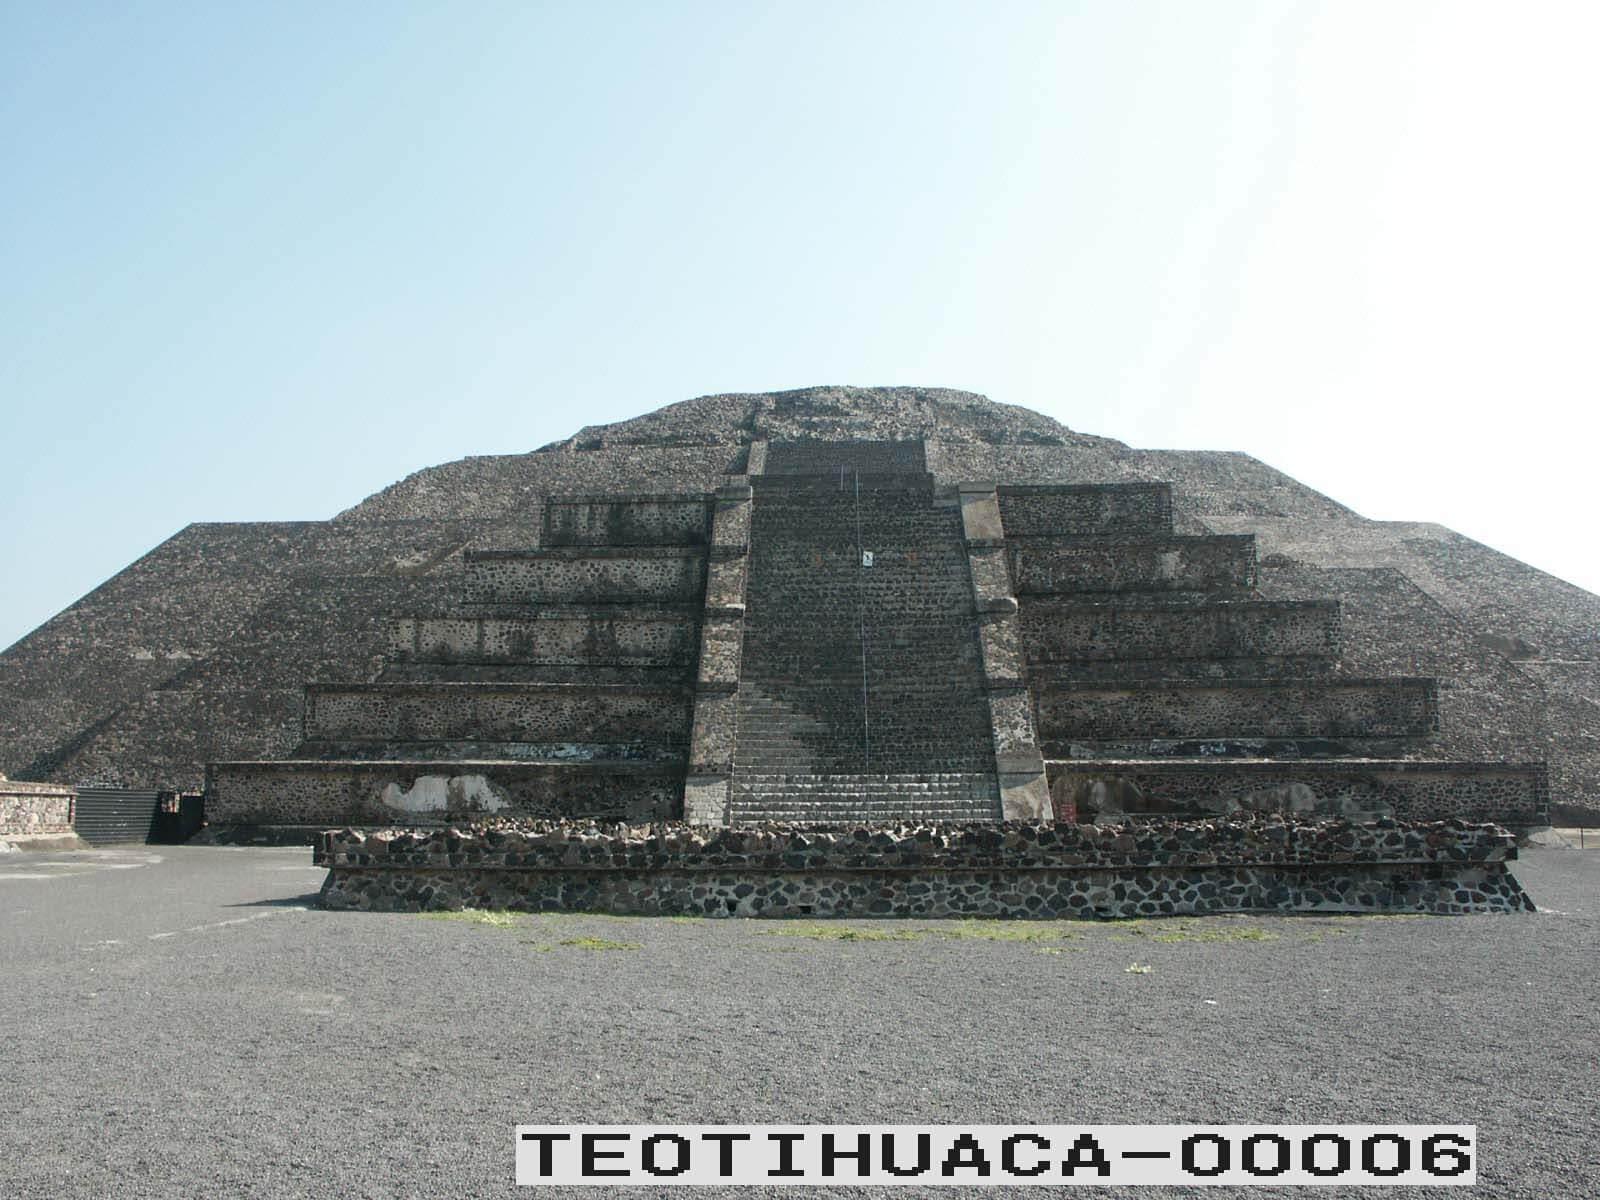 MEXIQUE-2004-032